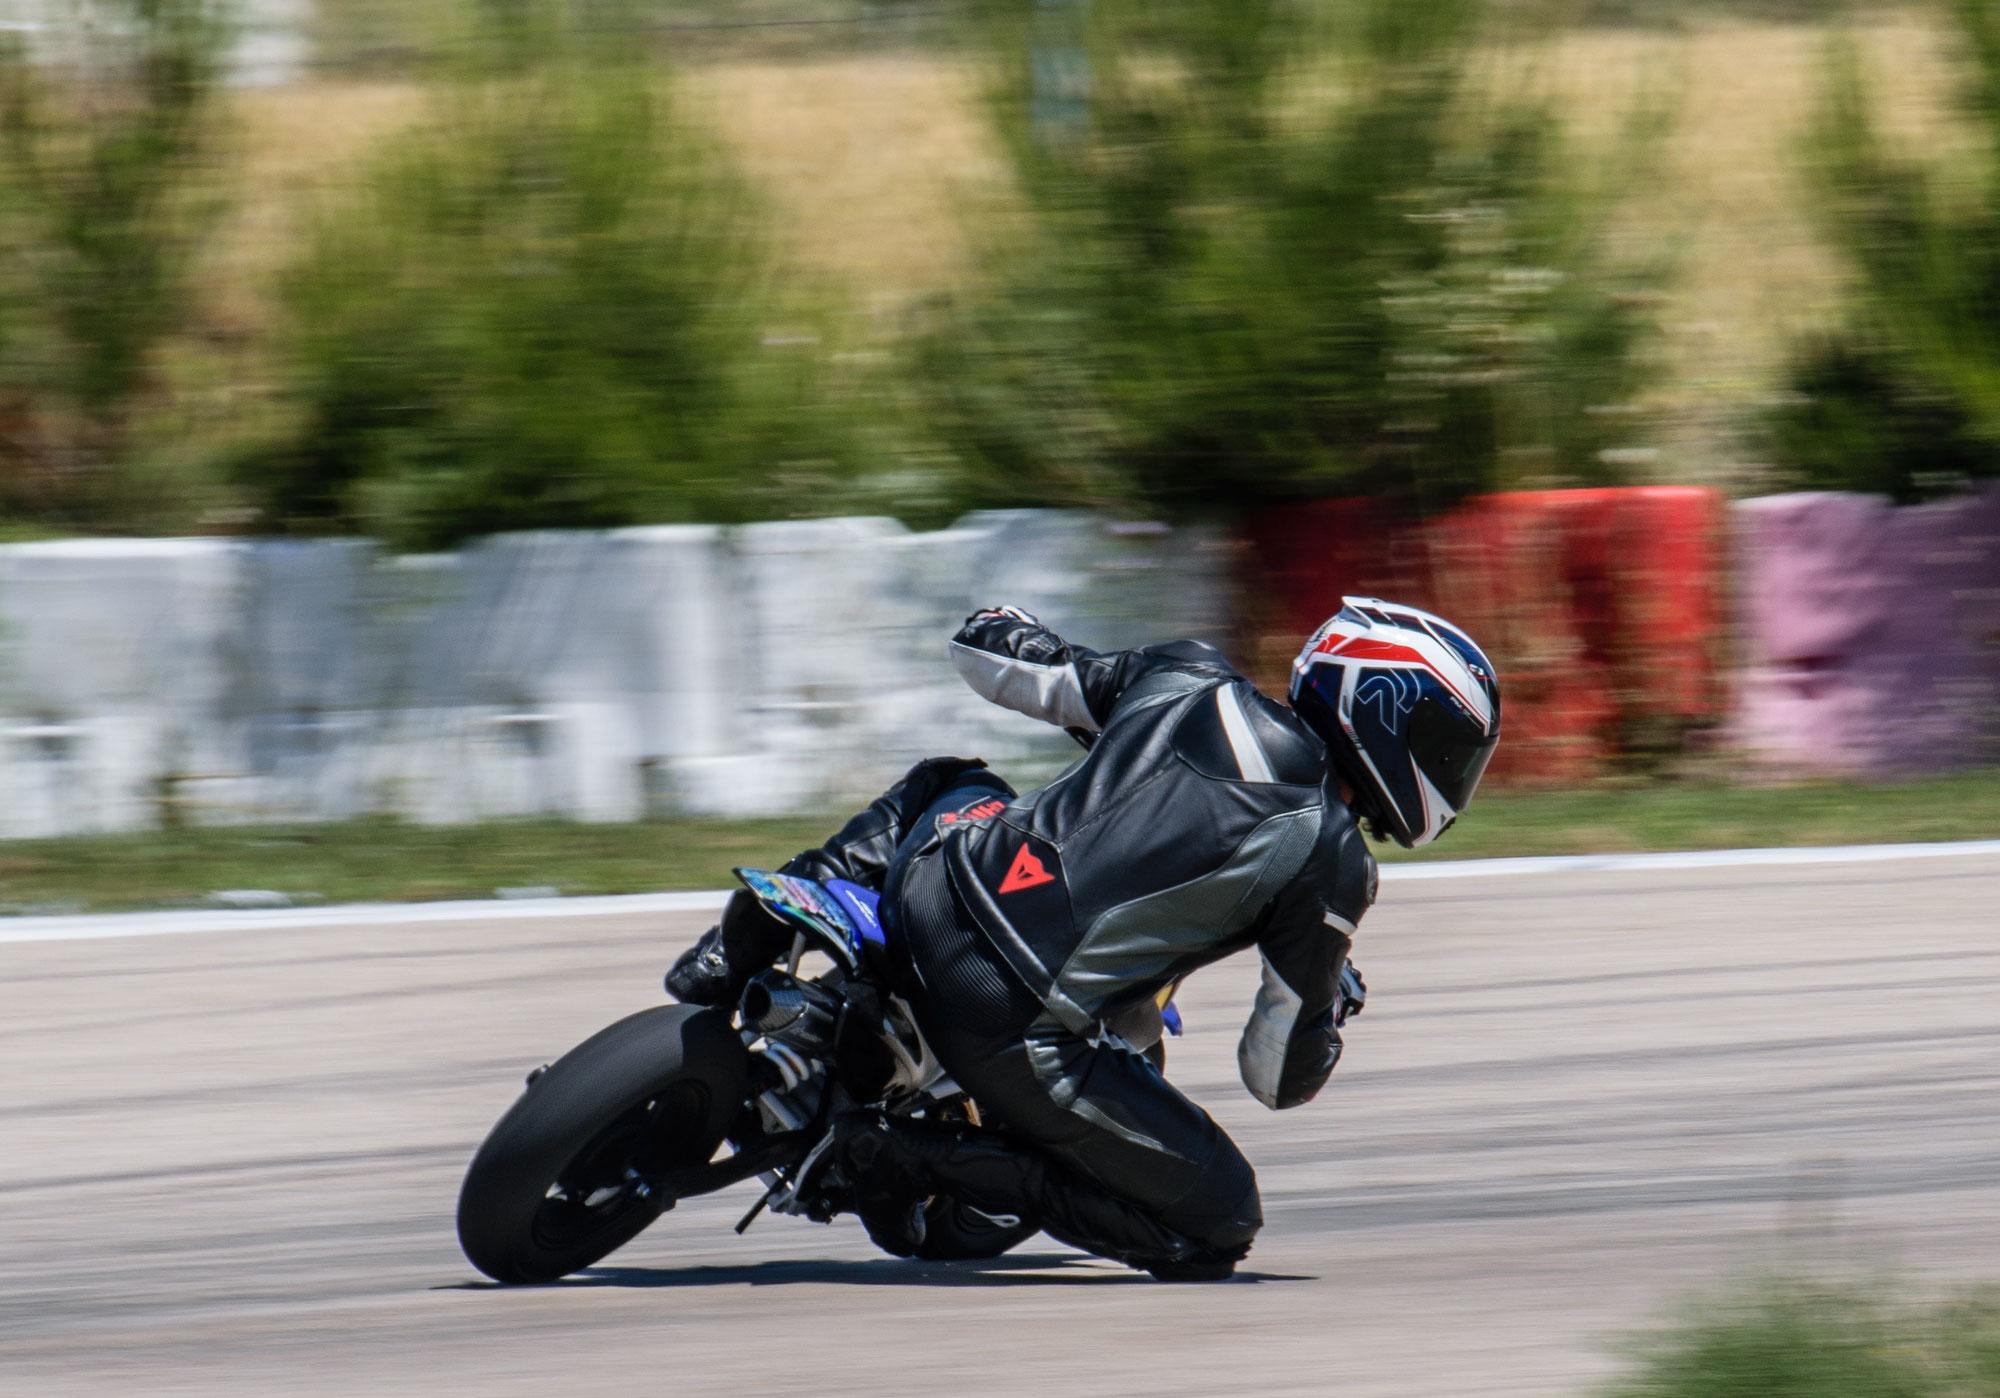 Motorradbekleidung - das musst Du beachten